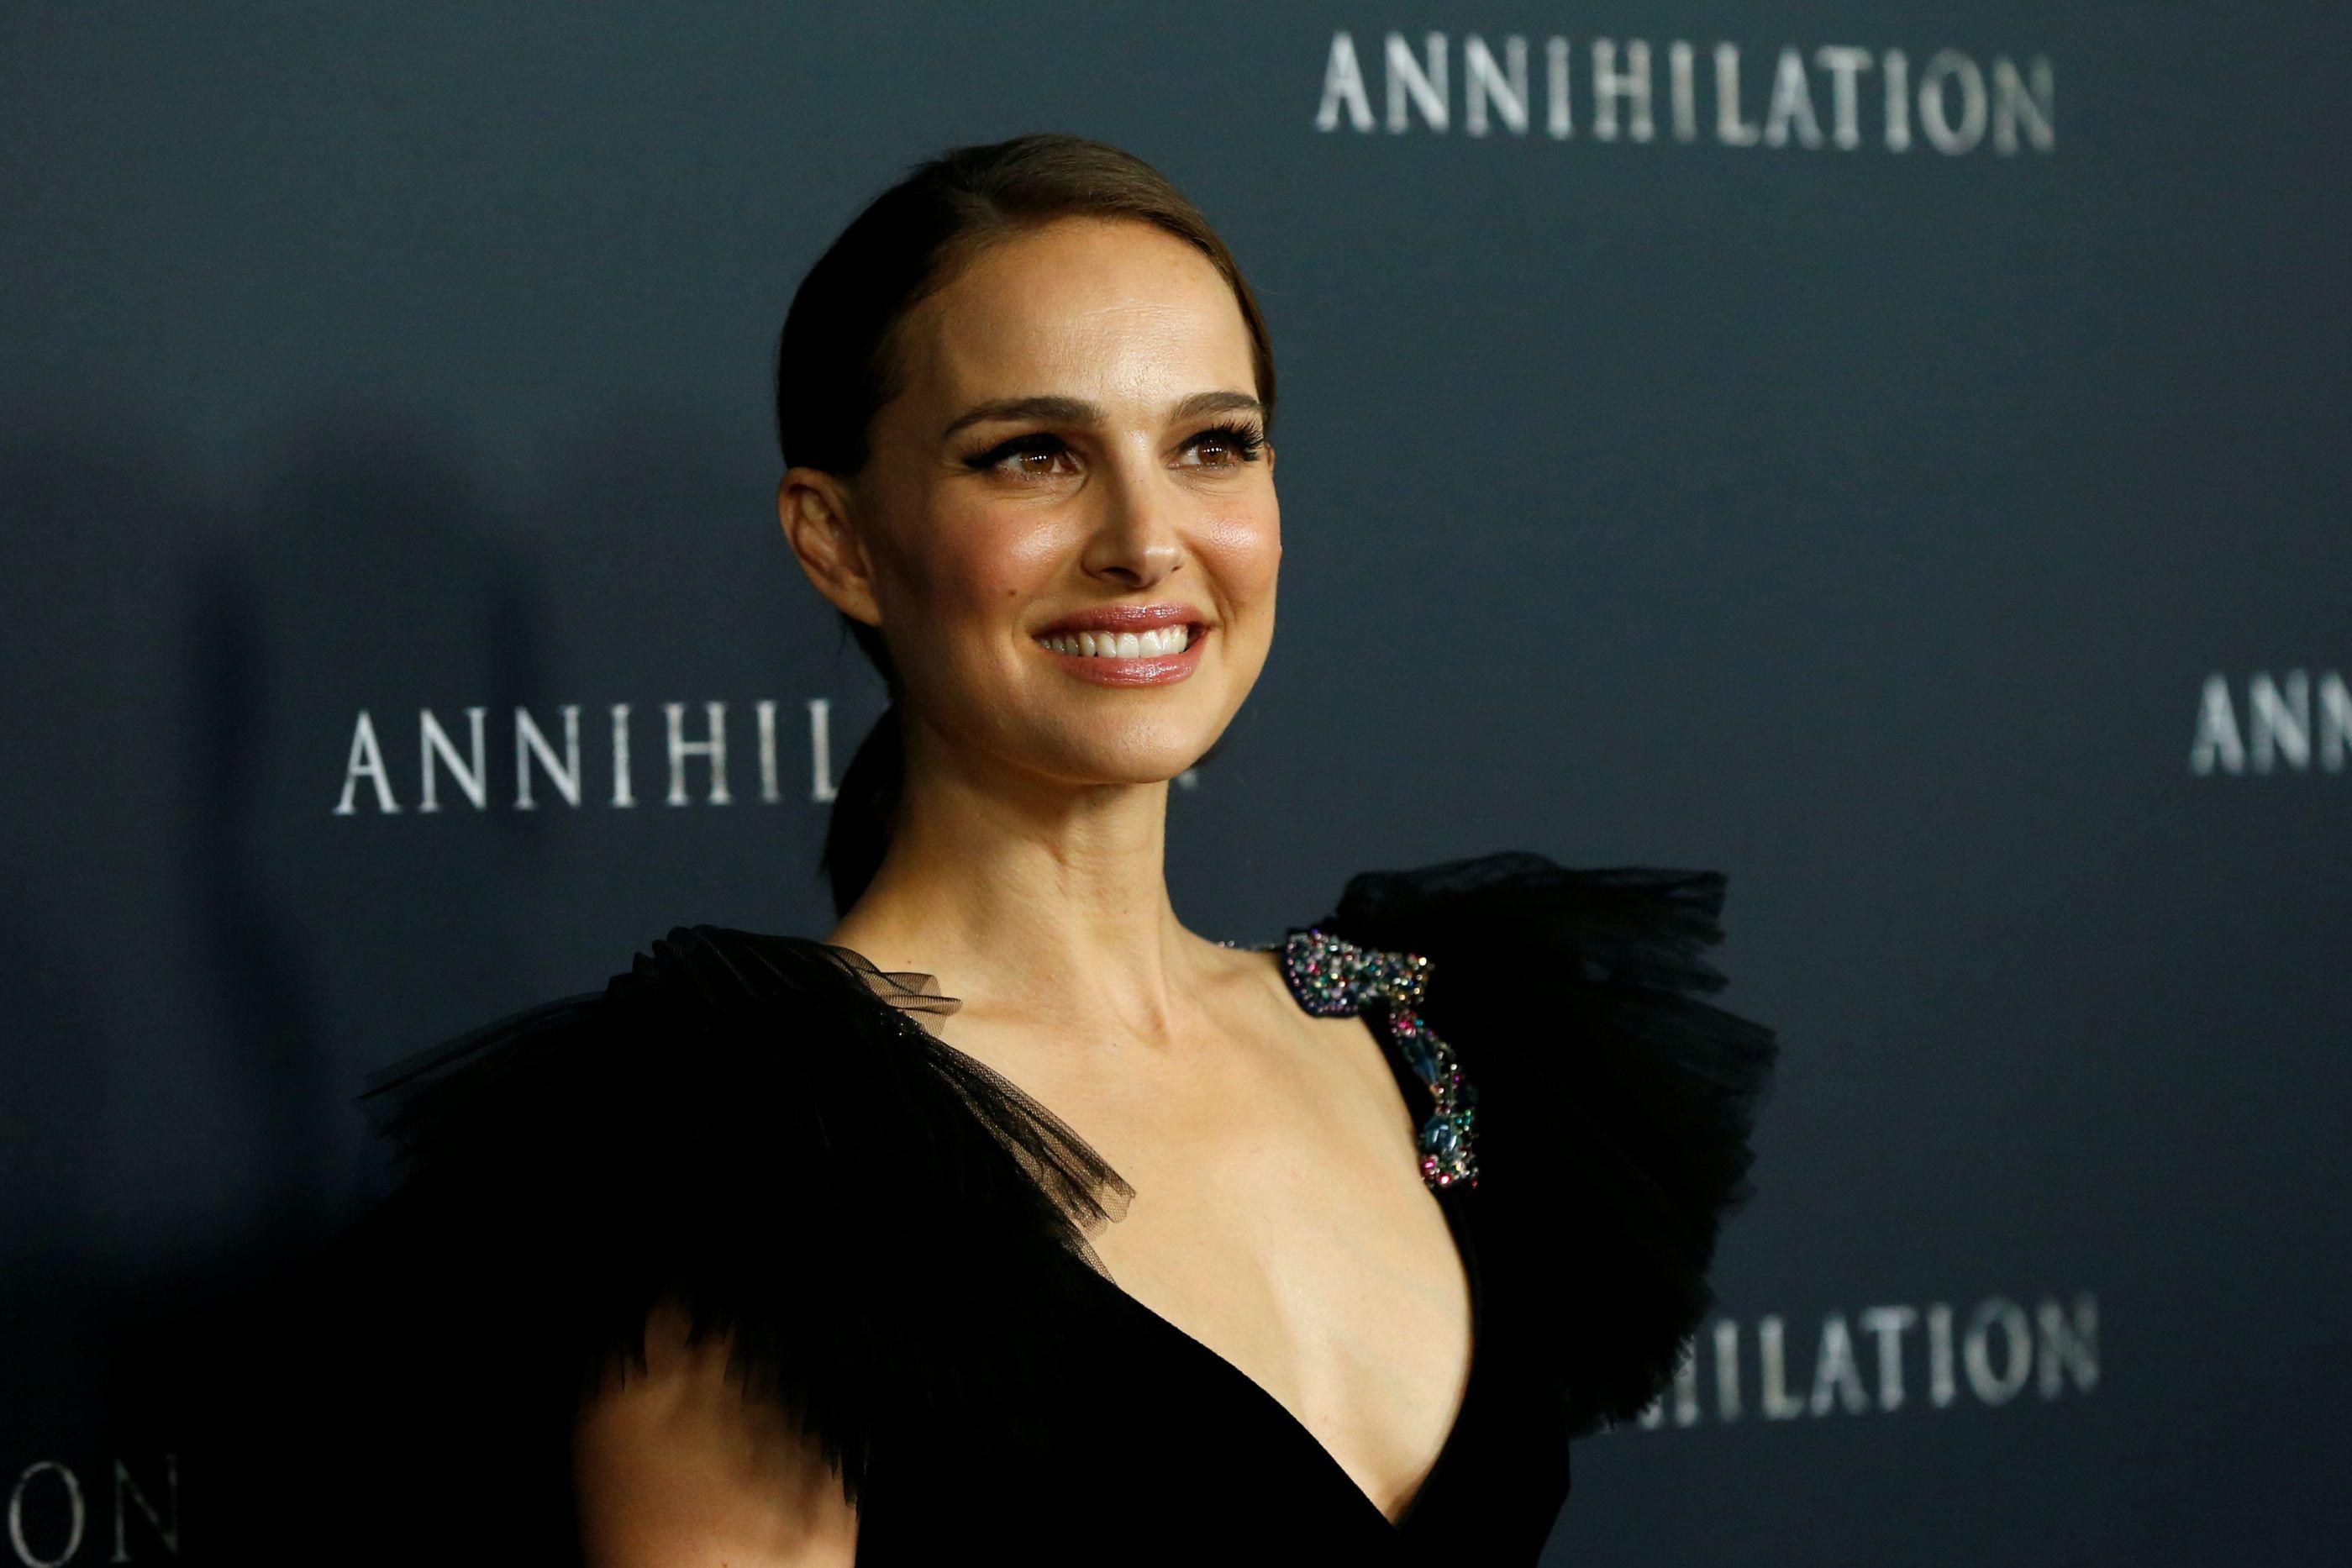 Natalie Portman faz visita surpresa a hospital pediátrico